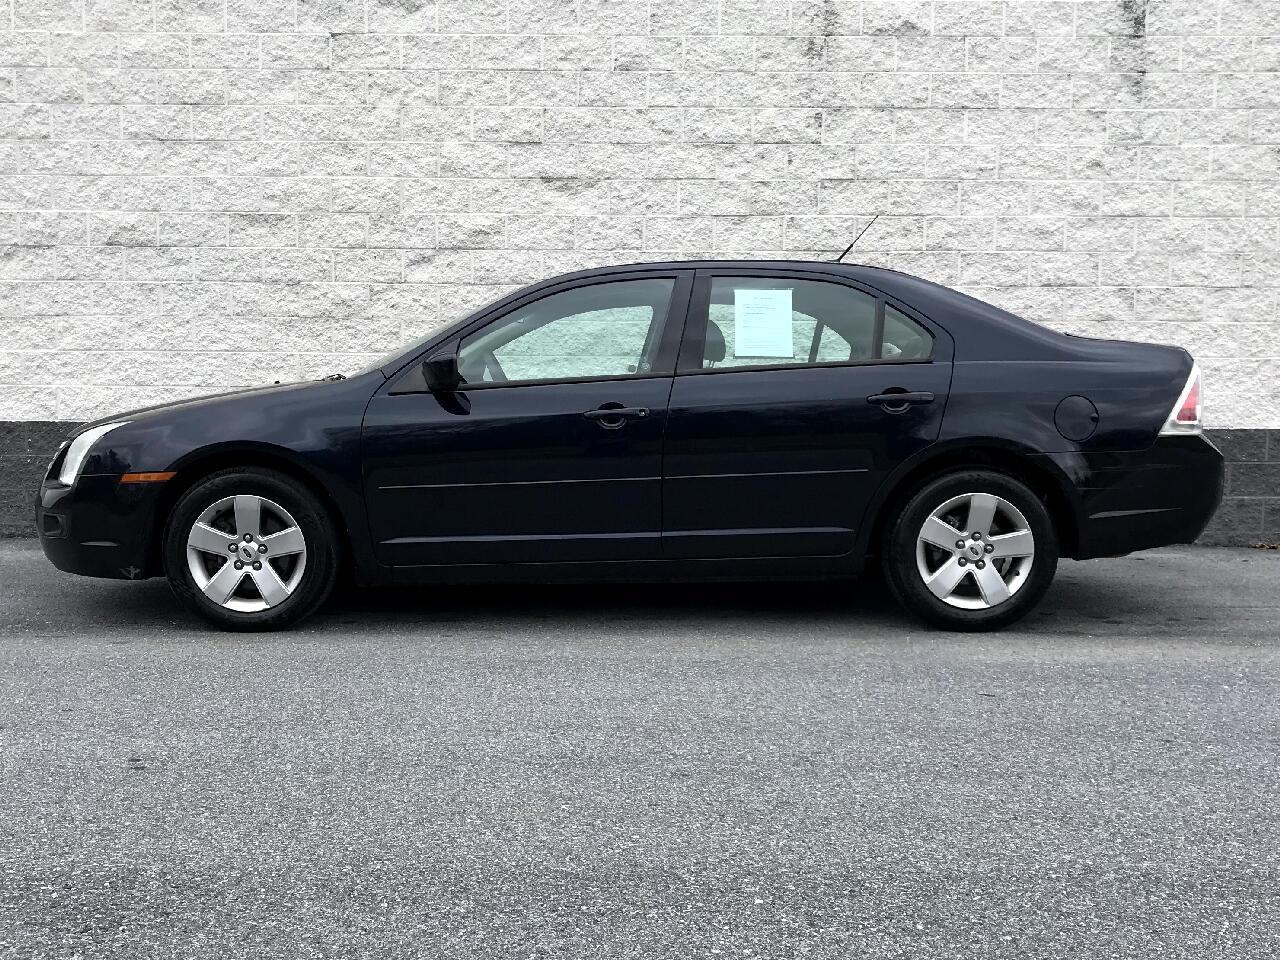 2008 Ford Fusion 4dr Sdn V6 SE